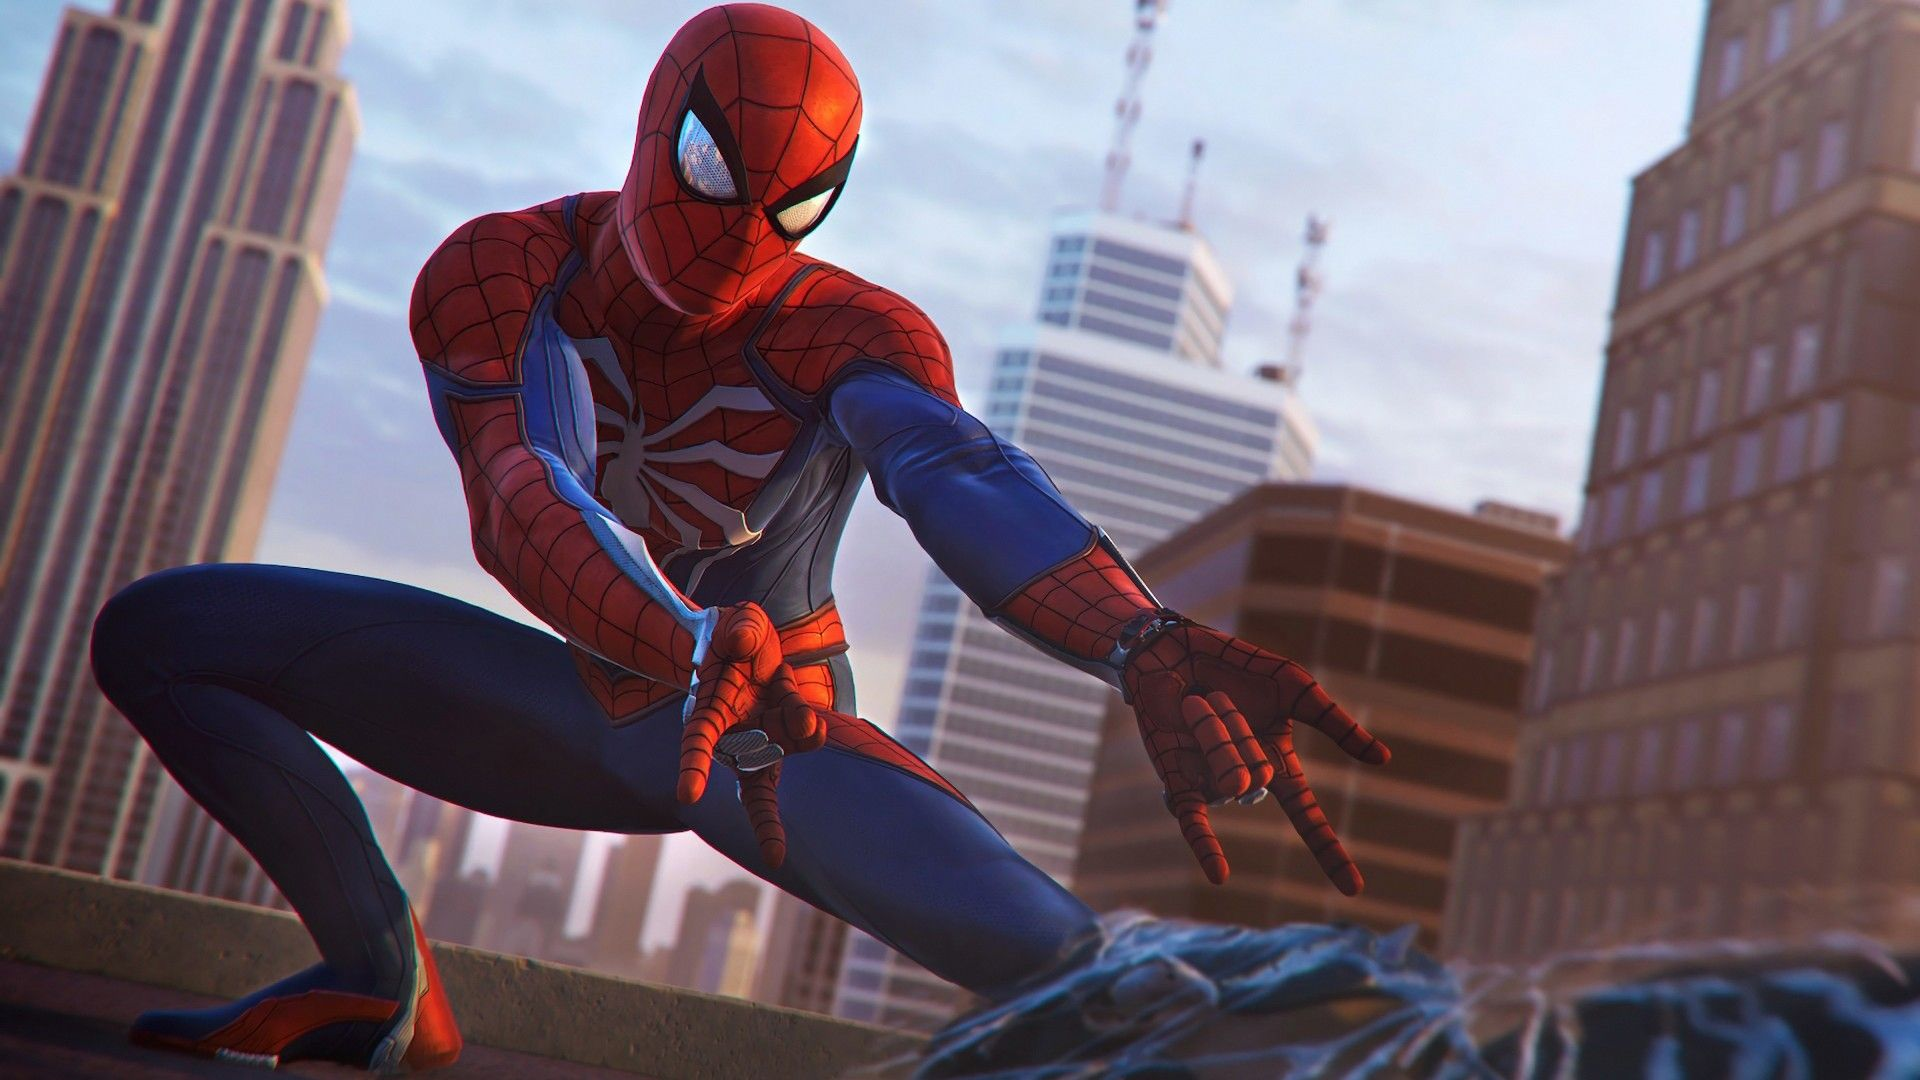 Spider Man Spiderman Spiderman Ps4 Marvel Spiderman